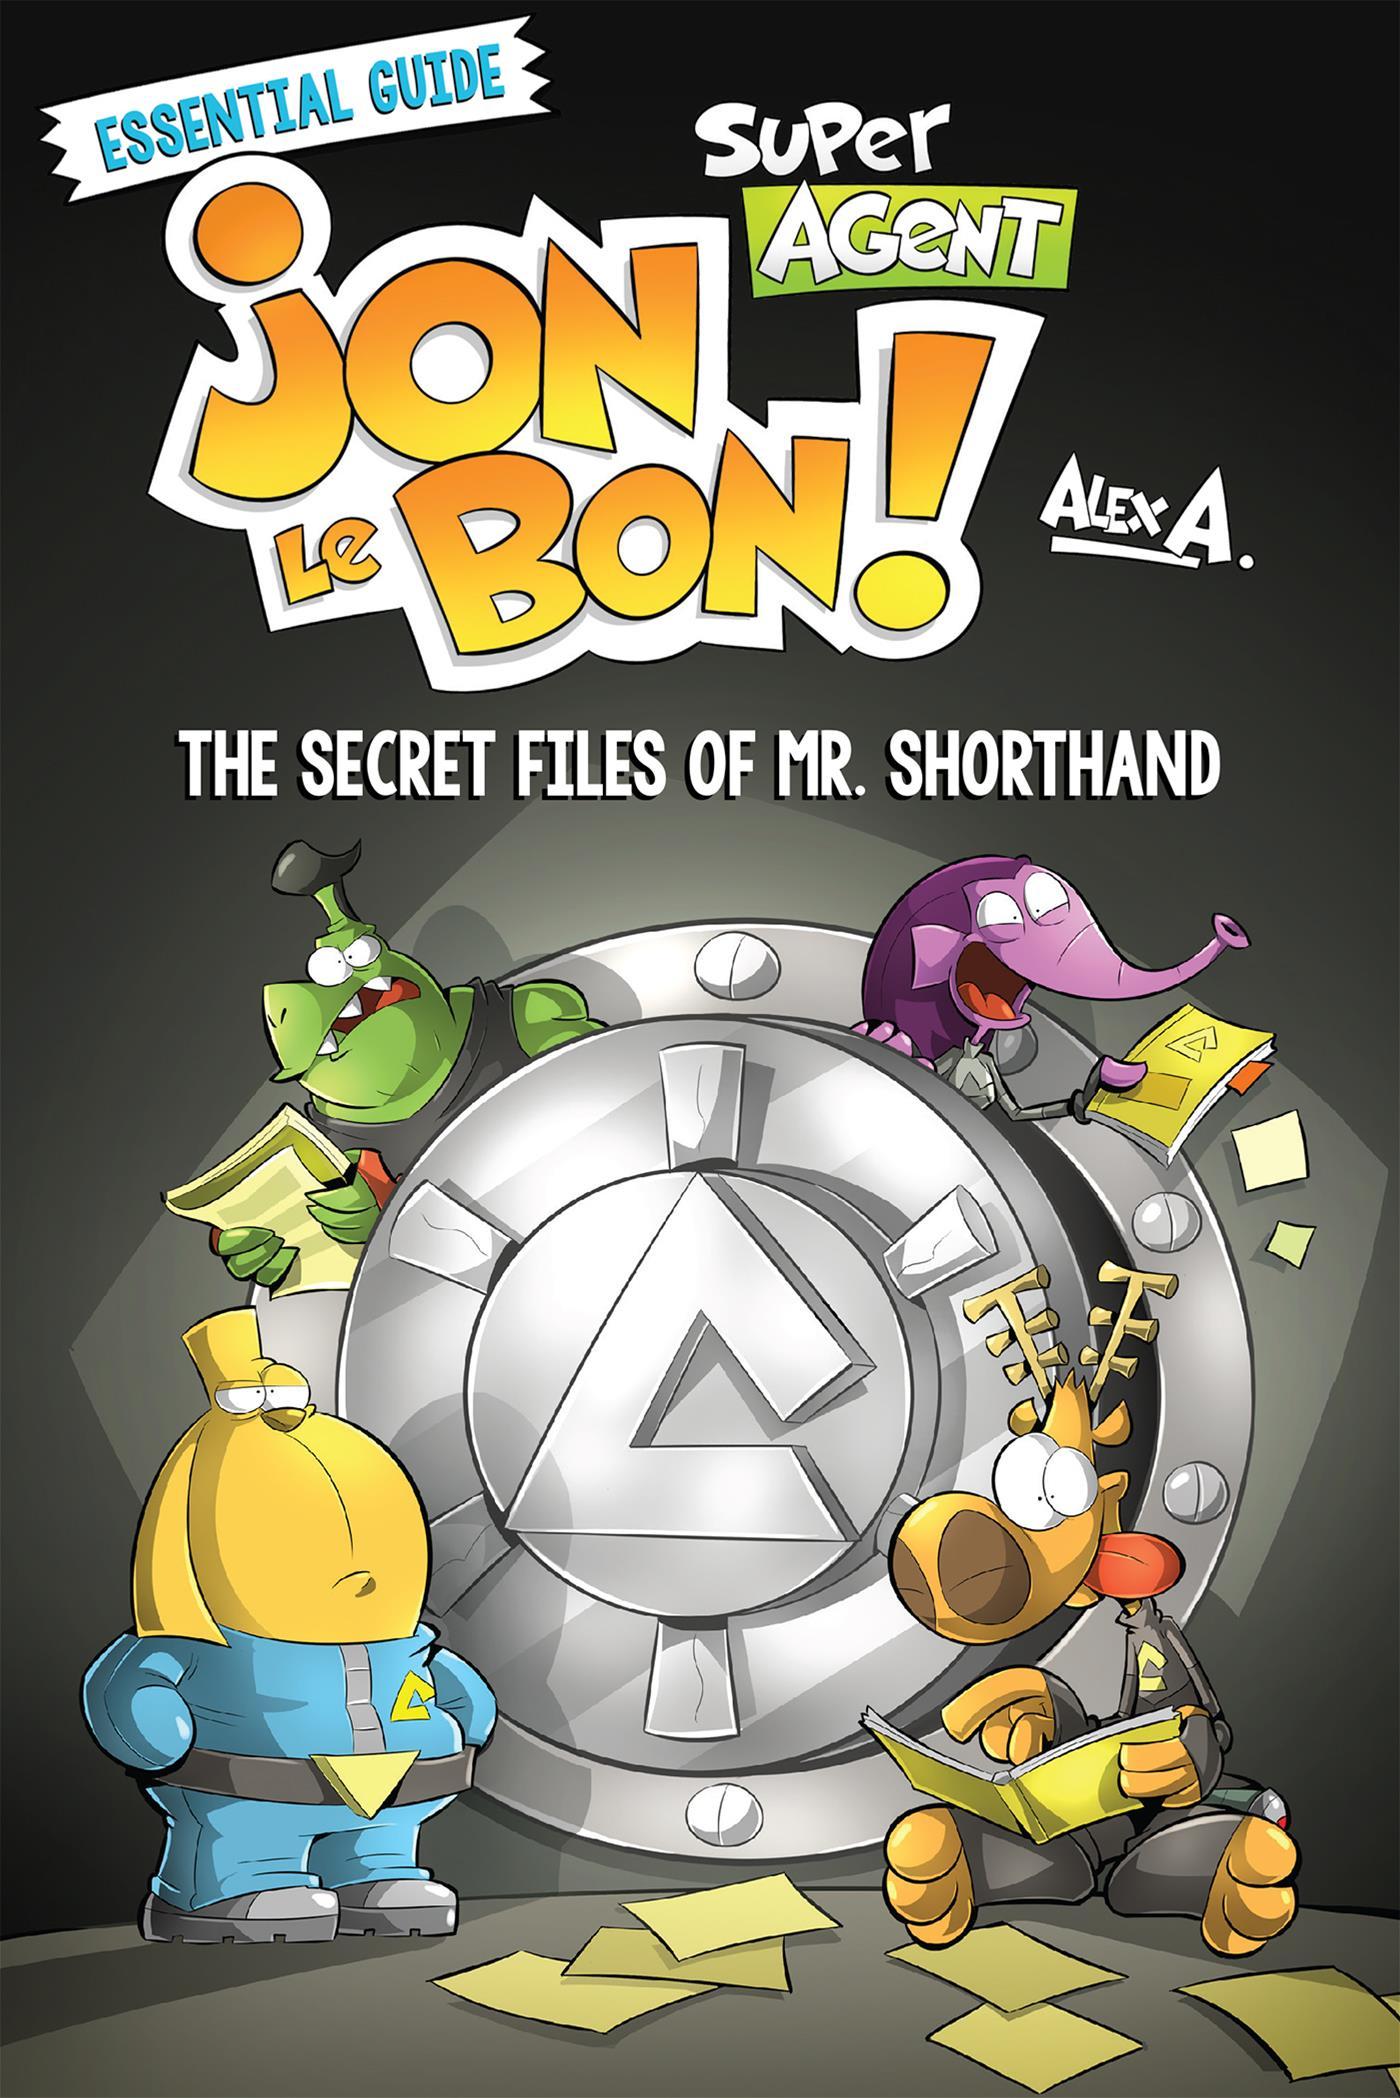 Super Agent Jon Le Bon !